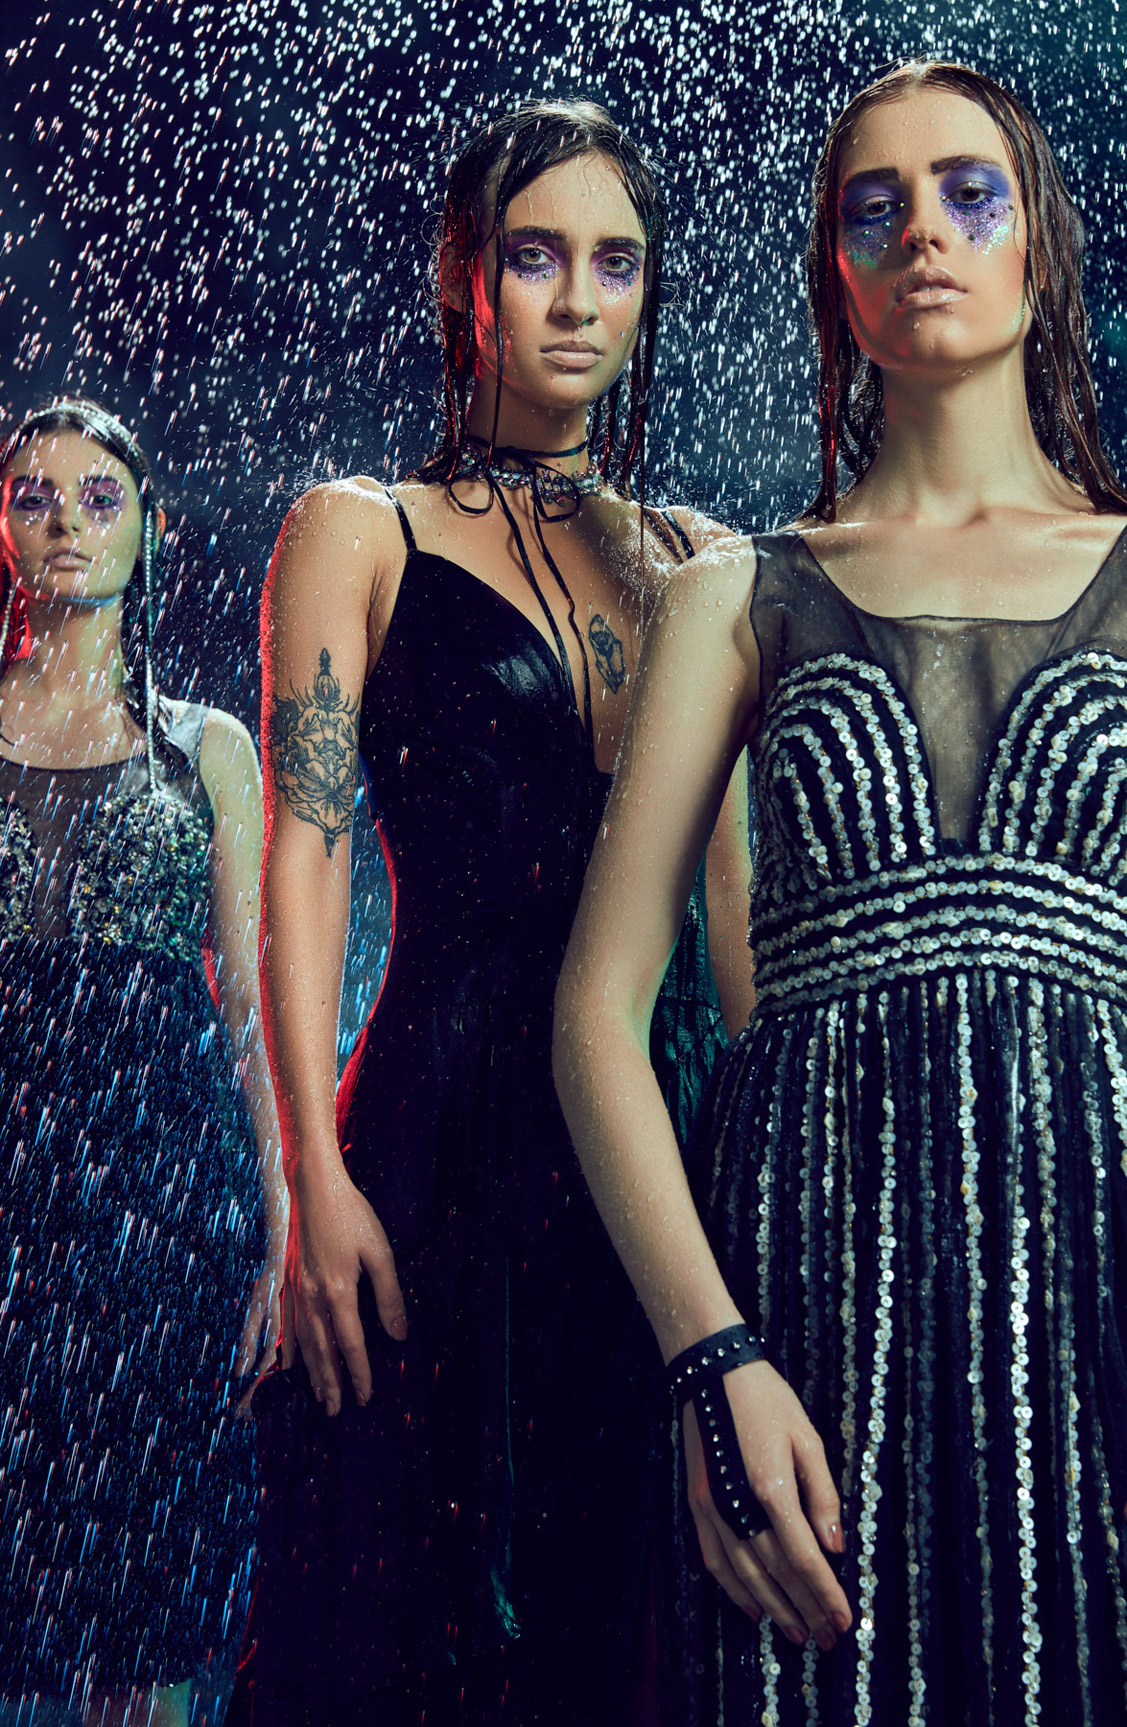 Relentless Rain / Marina Belckina, Marina Kuzinkina, Patrycja Krzywon by Priyankk Nandwana